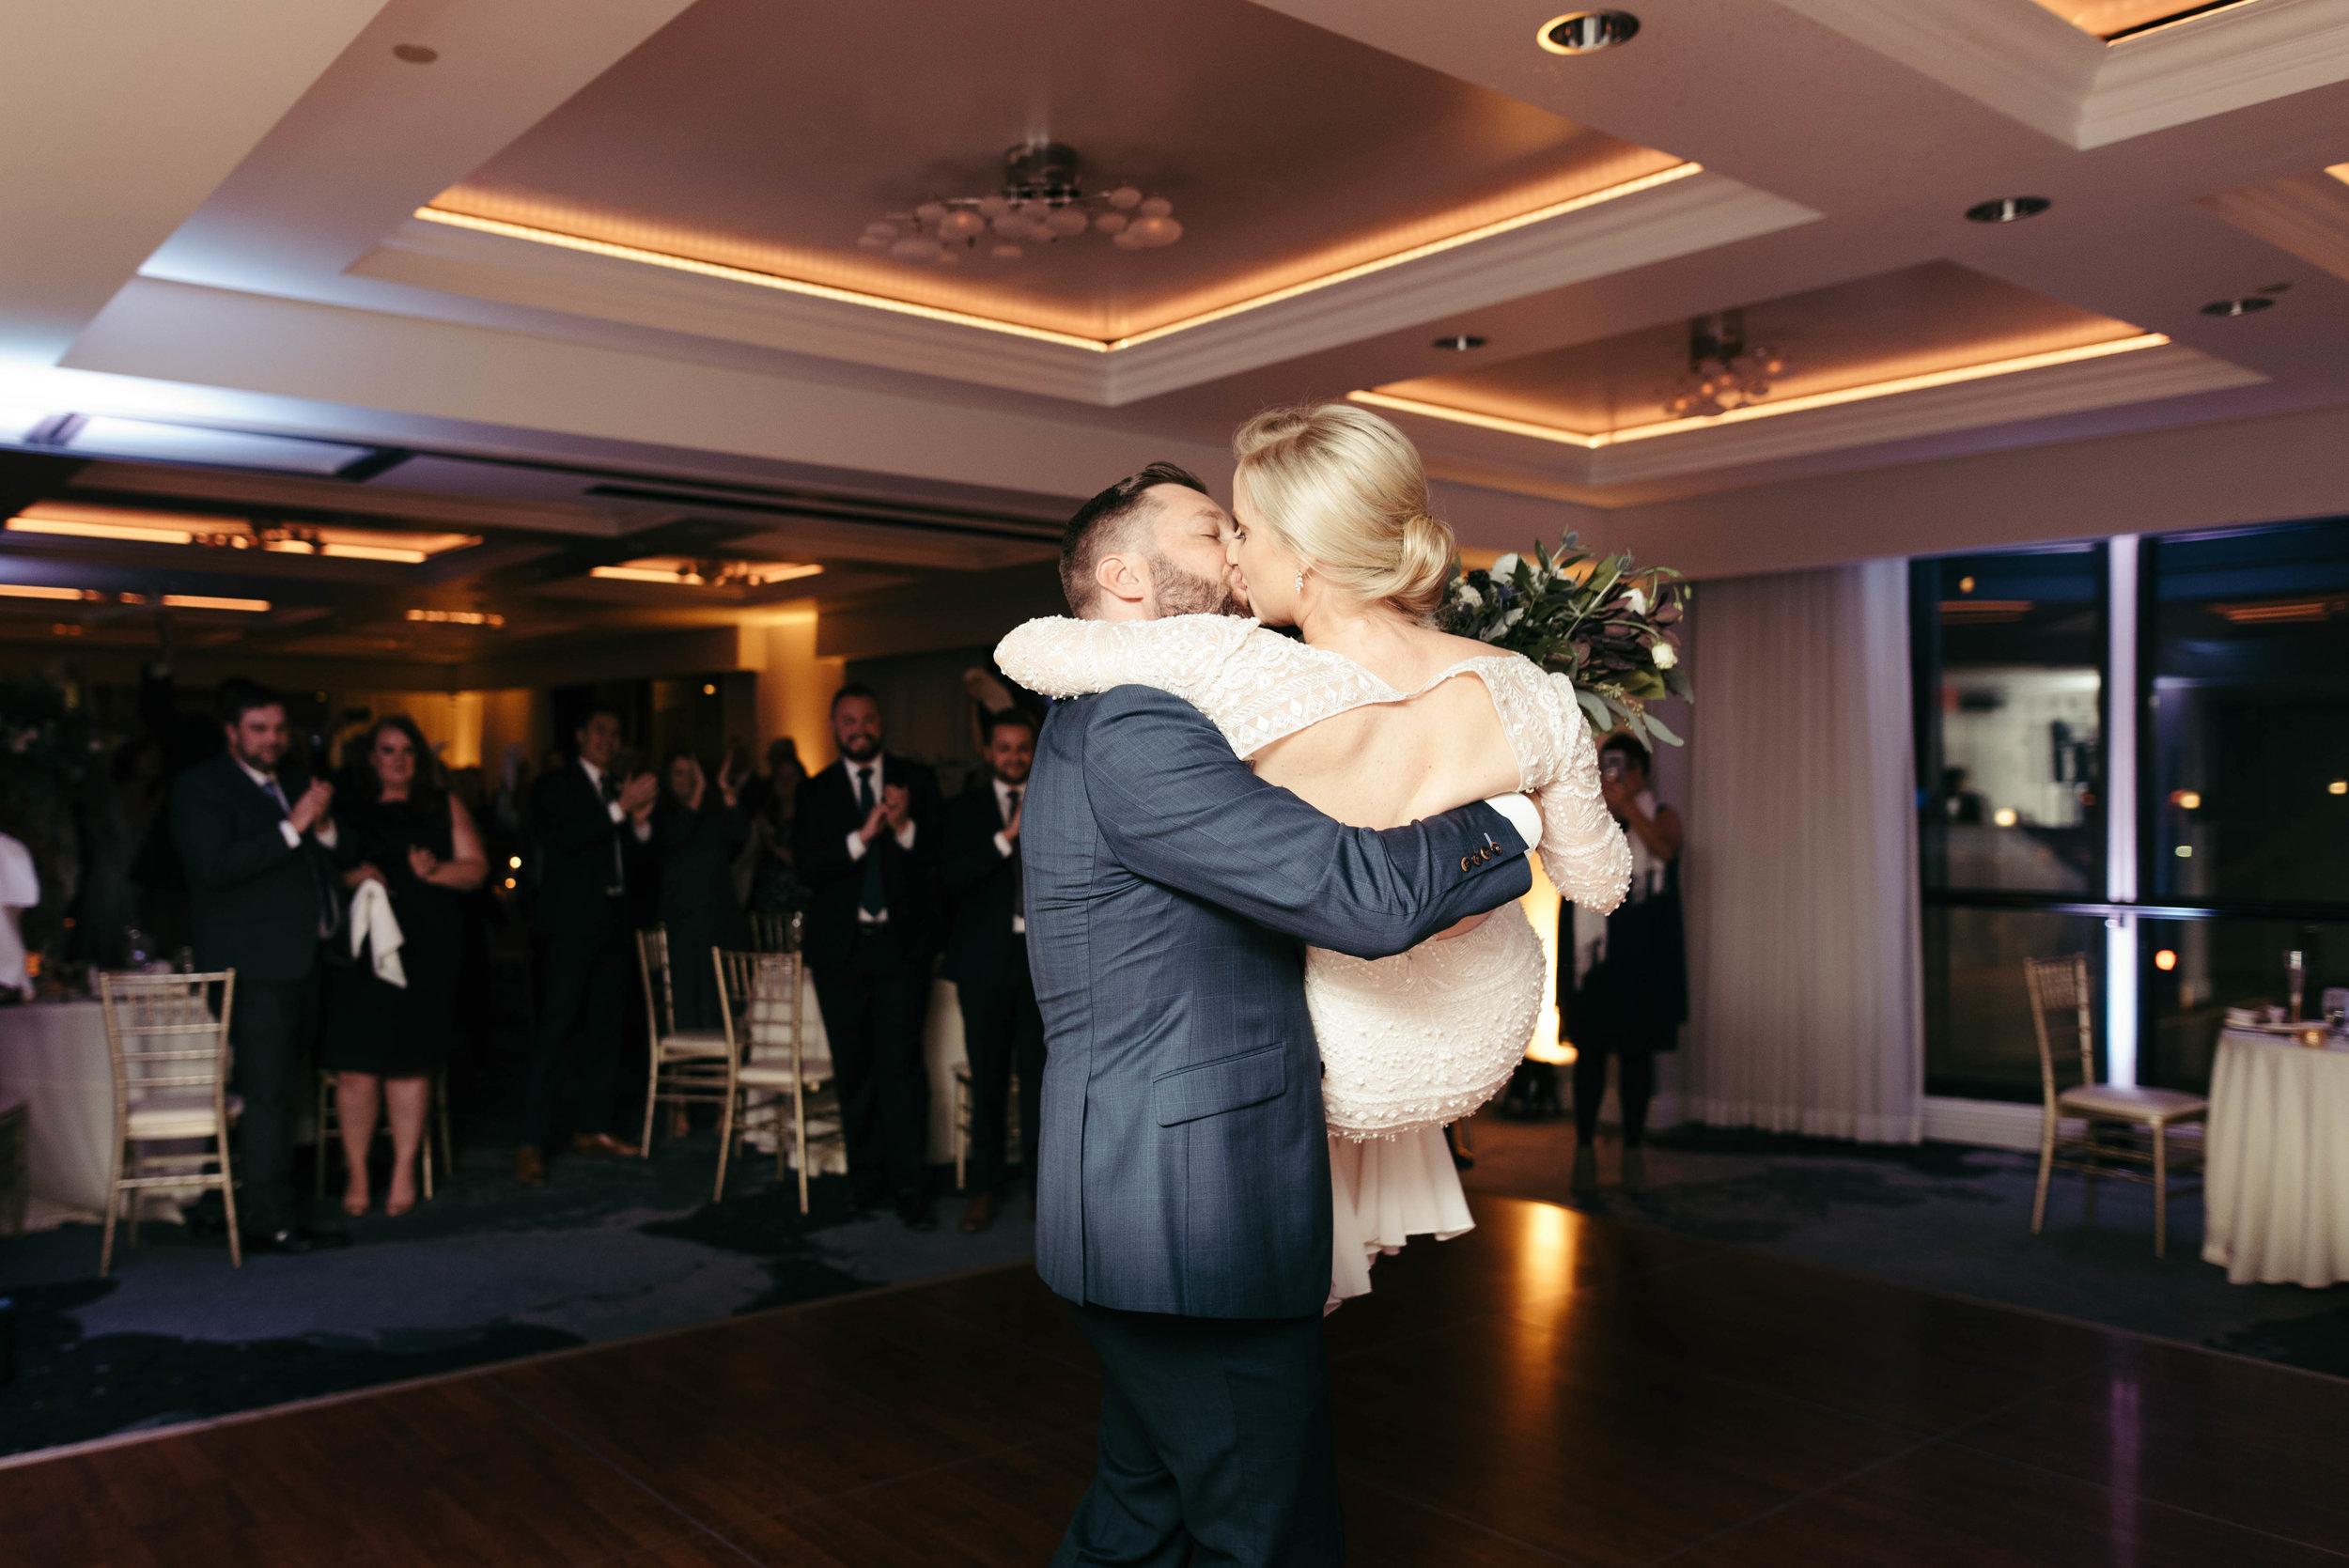 renaissance hotel wedding photos-46.jpg